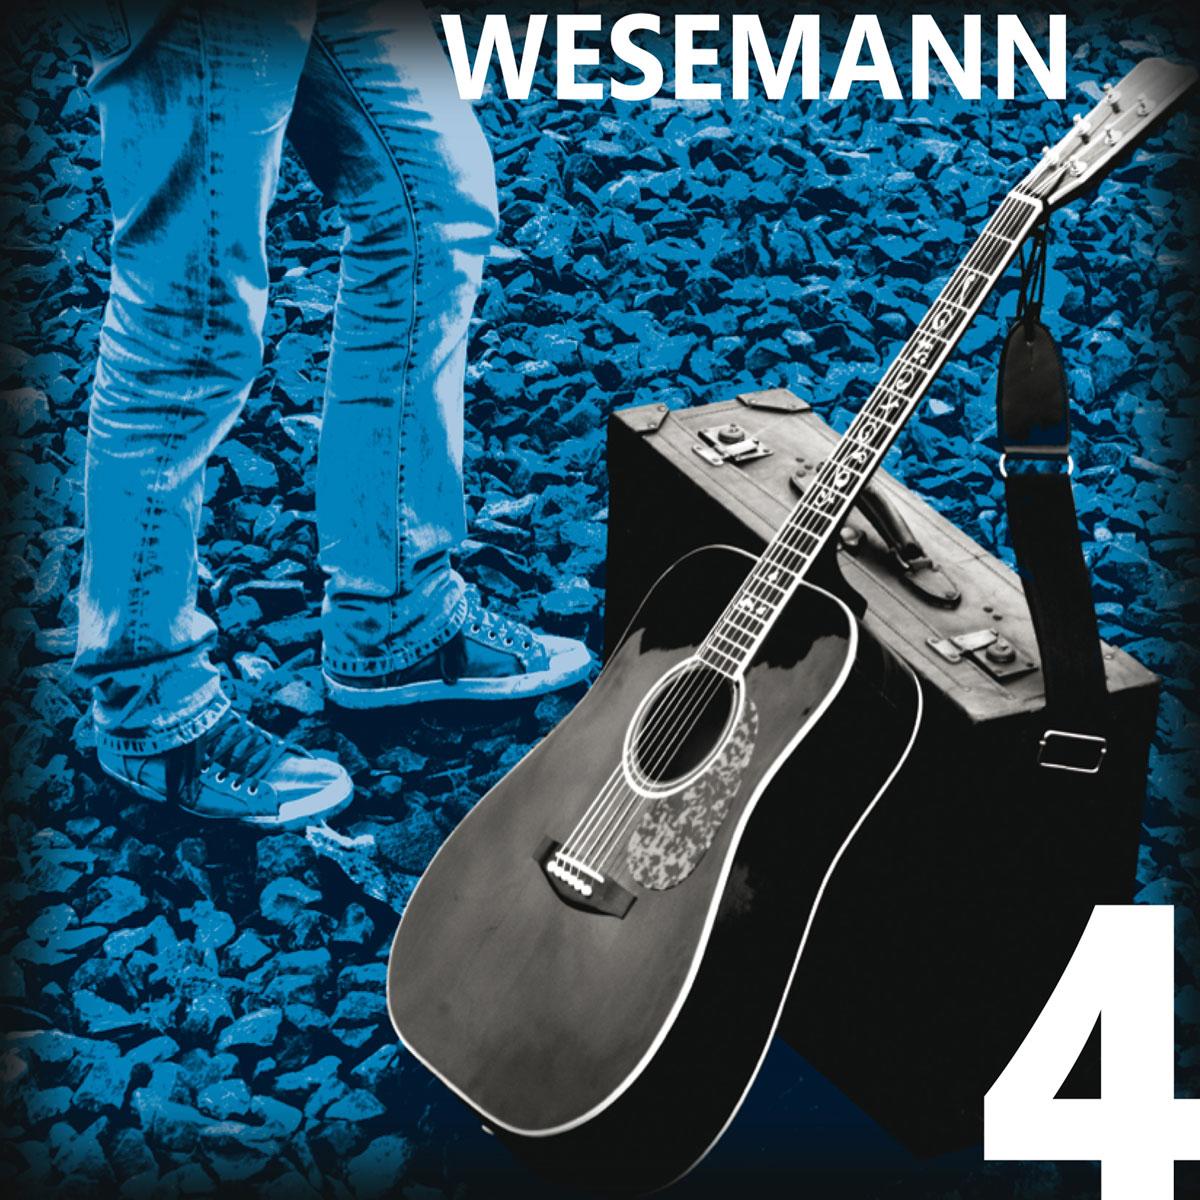 frank-wesemann-album-no-4